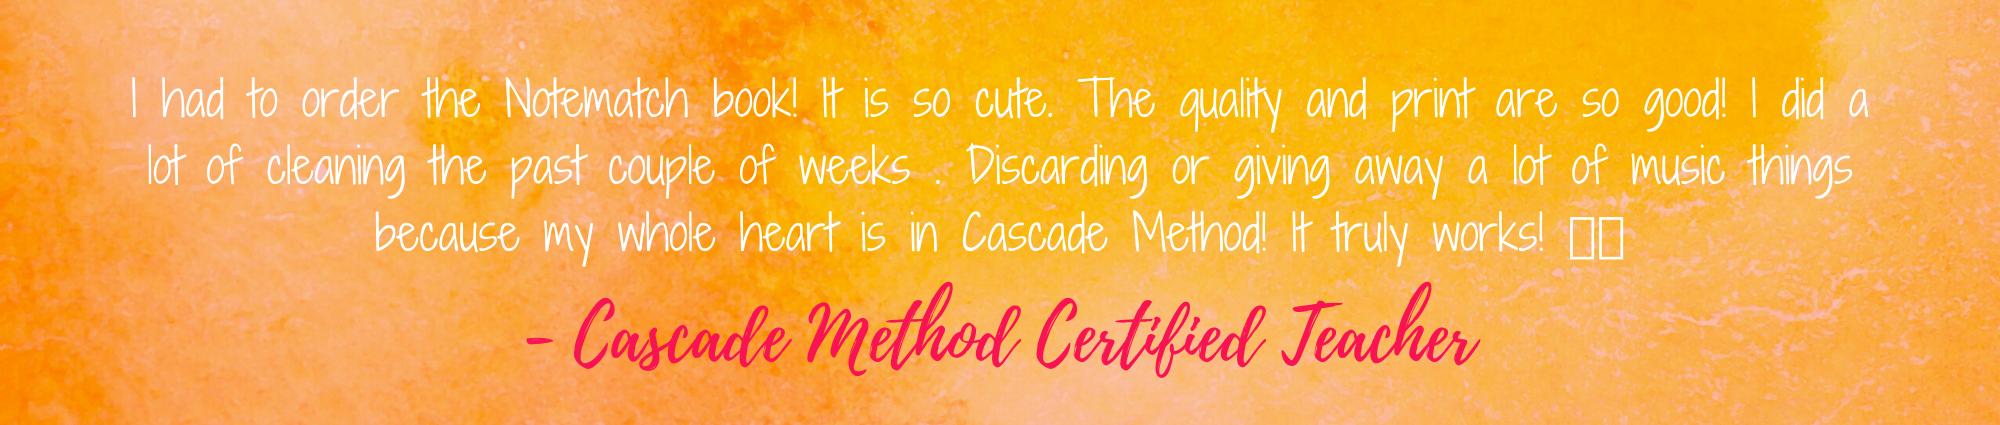 Cascade Method Testimonial on NoteMatch Book 1